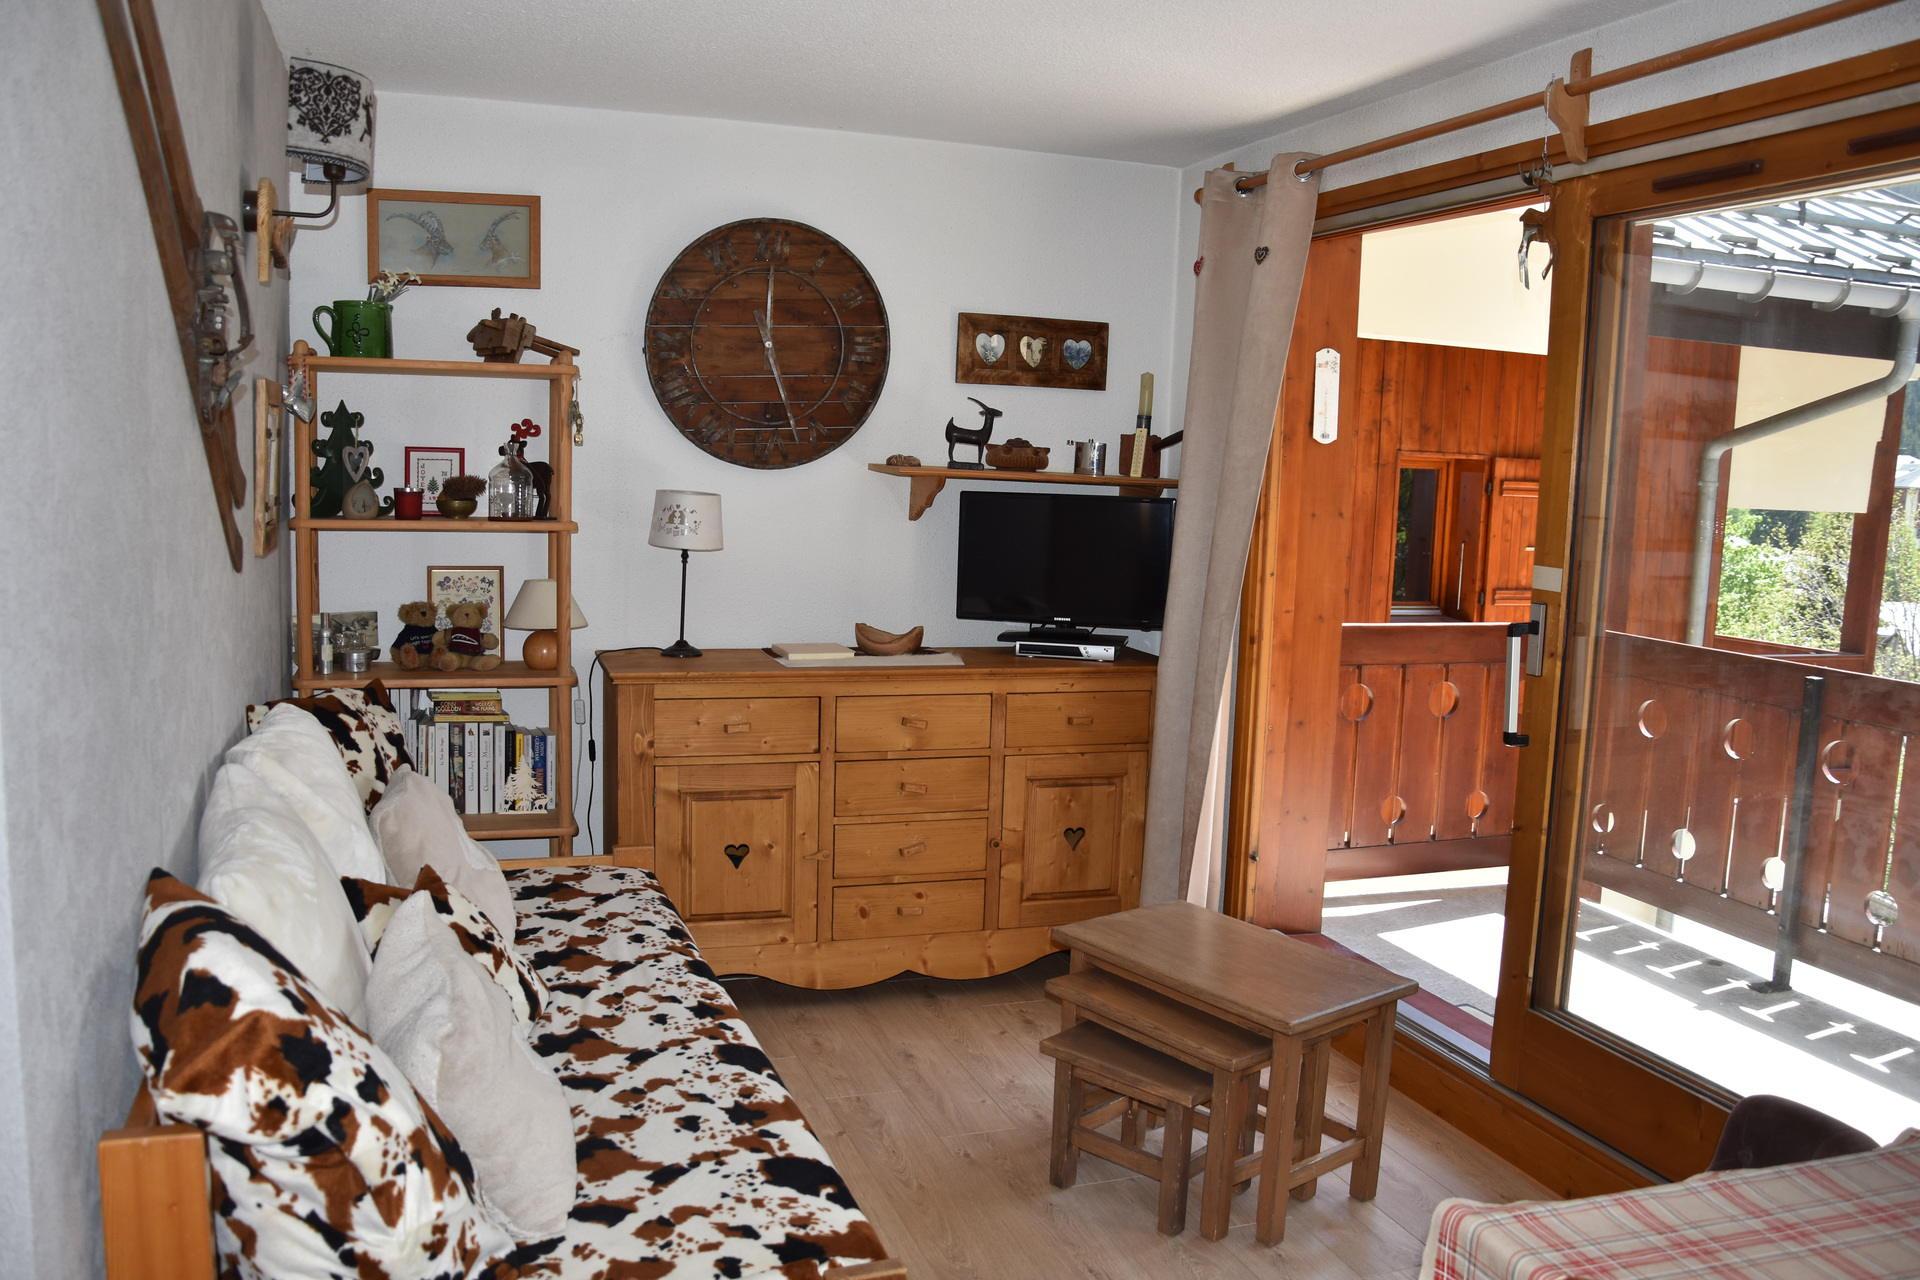 Rental reference : GLACIEB6 to Pralognan la Vanoise